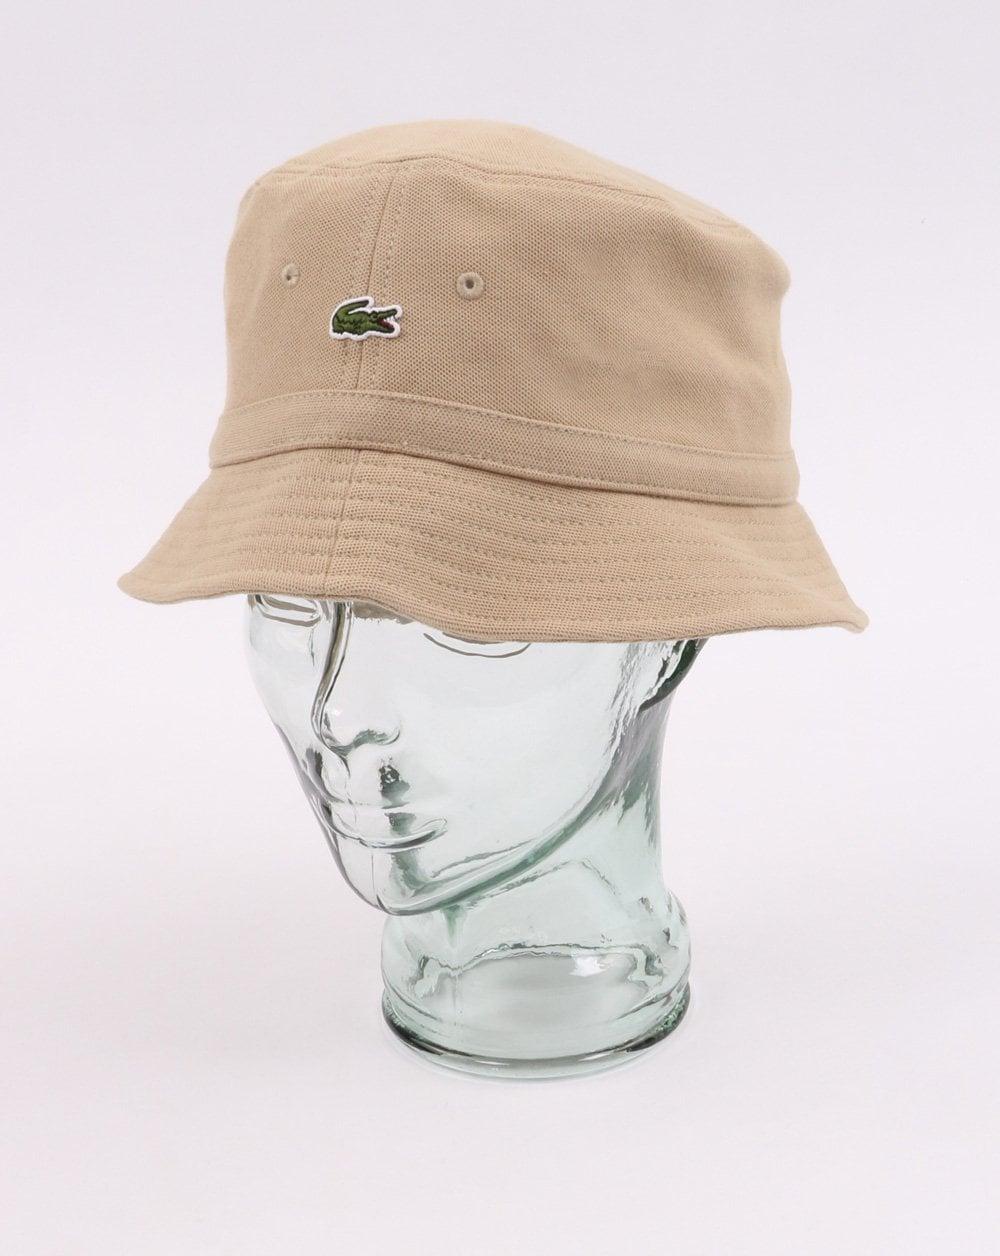 0df44816a6e570 Lacoste Bucket Hat in Beige | 80s Casual Classics